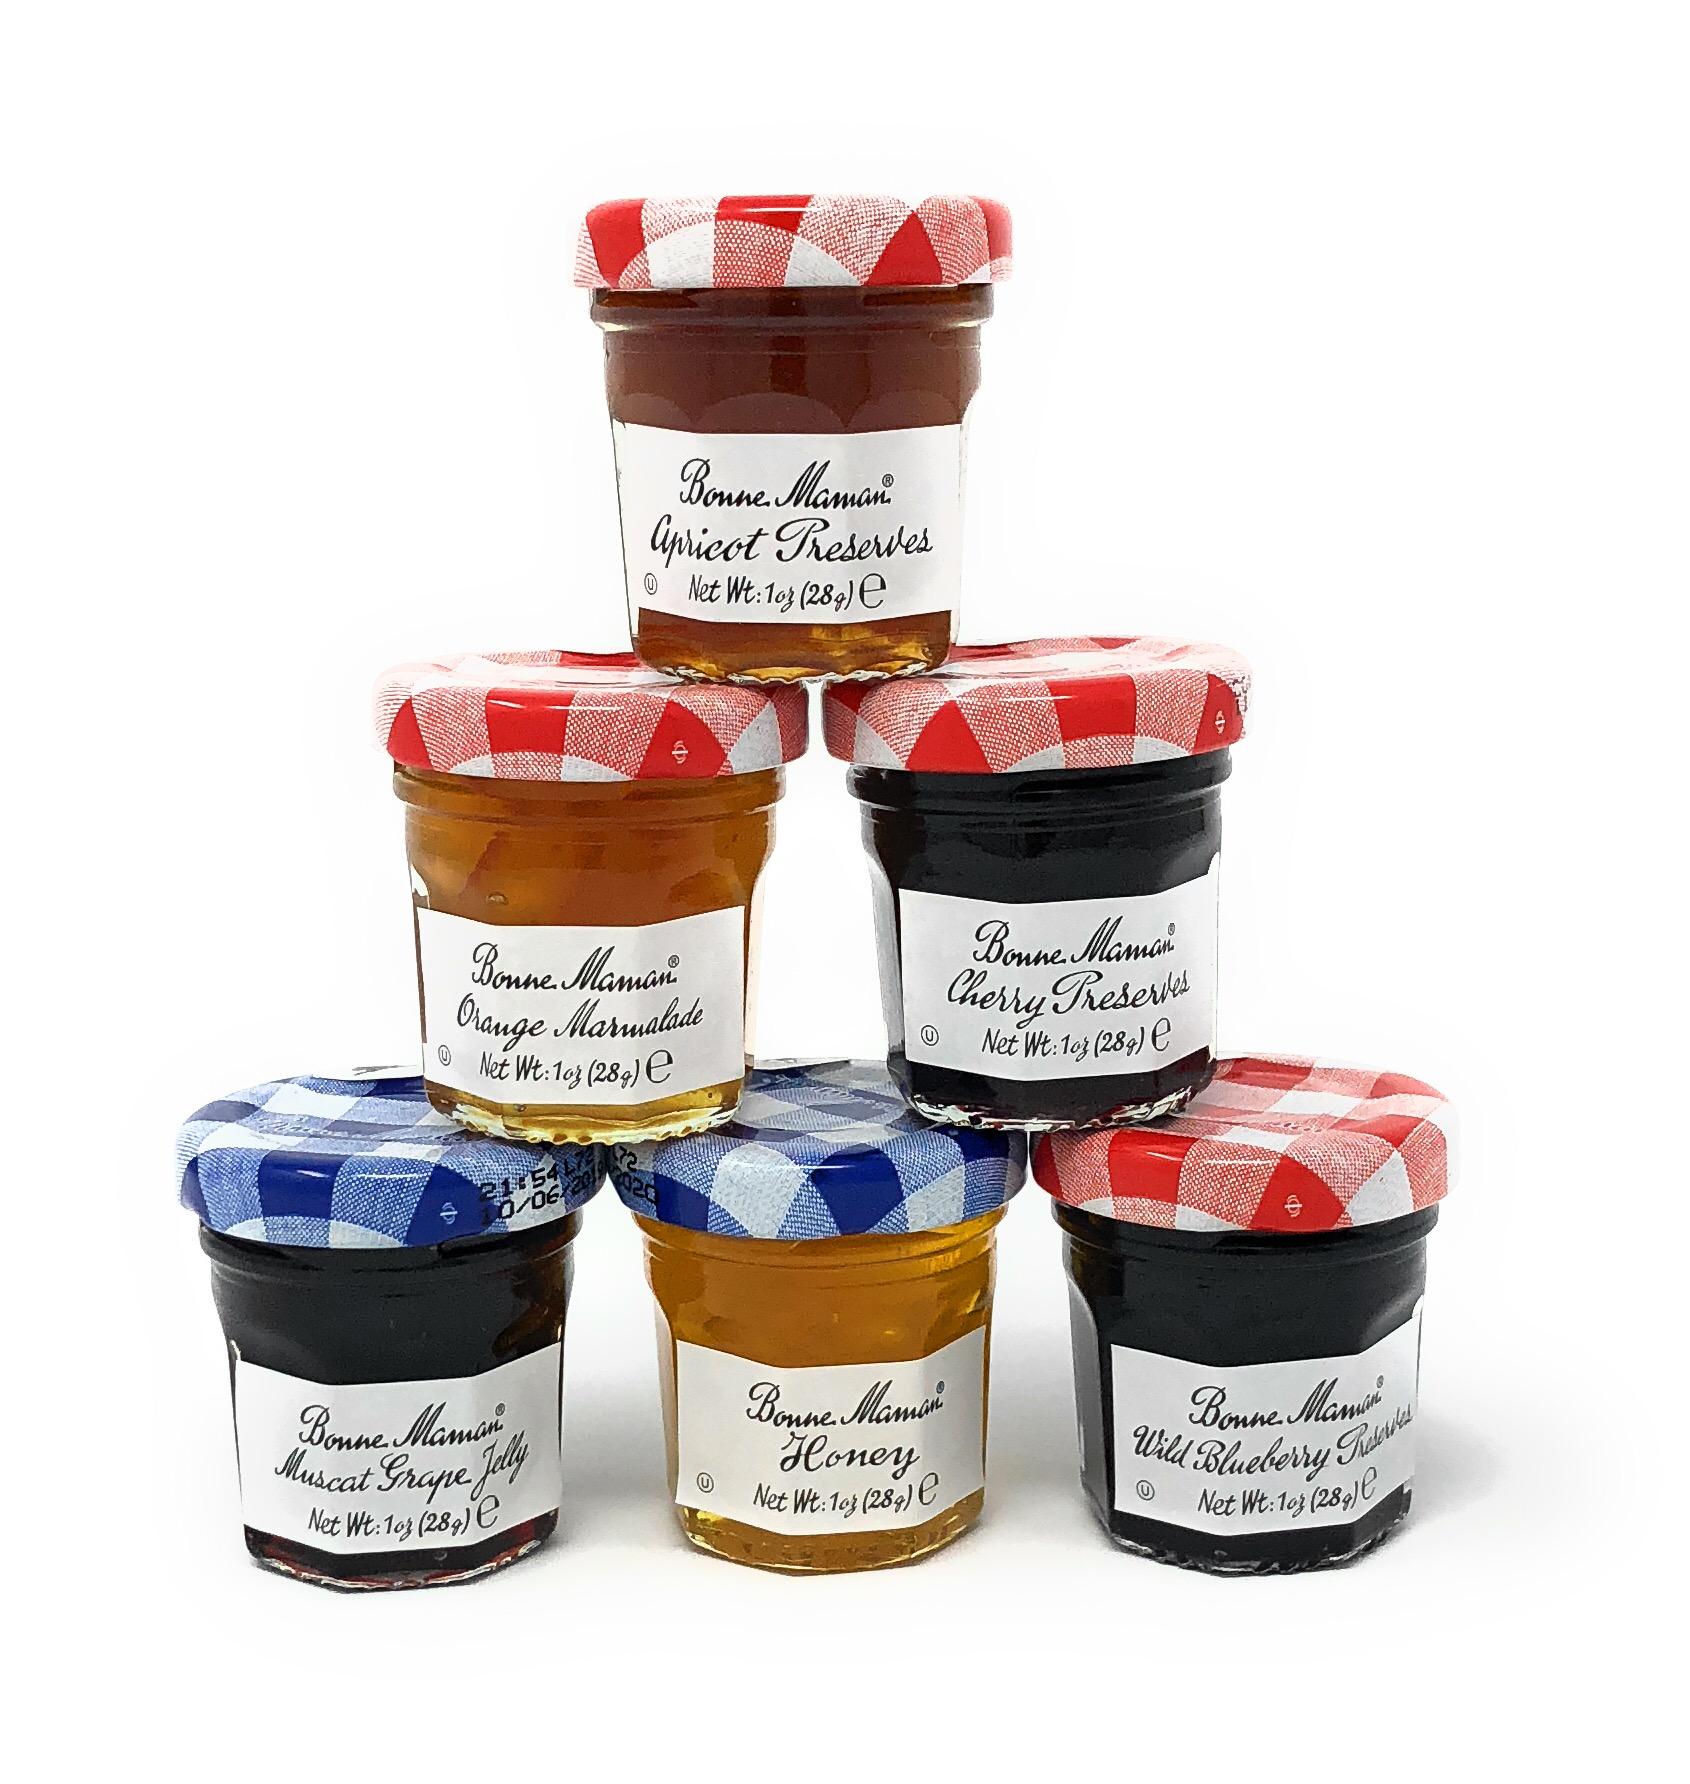 Bonne Maman Jam Assorted - 5 Apricot, 5 Orange, 5 Cherry, 5 Honey, 5 Grape, 5 Blueberry - 30 jelly jars x 1 oz each